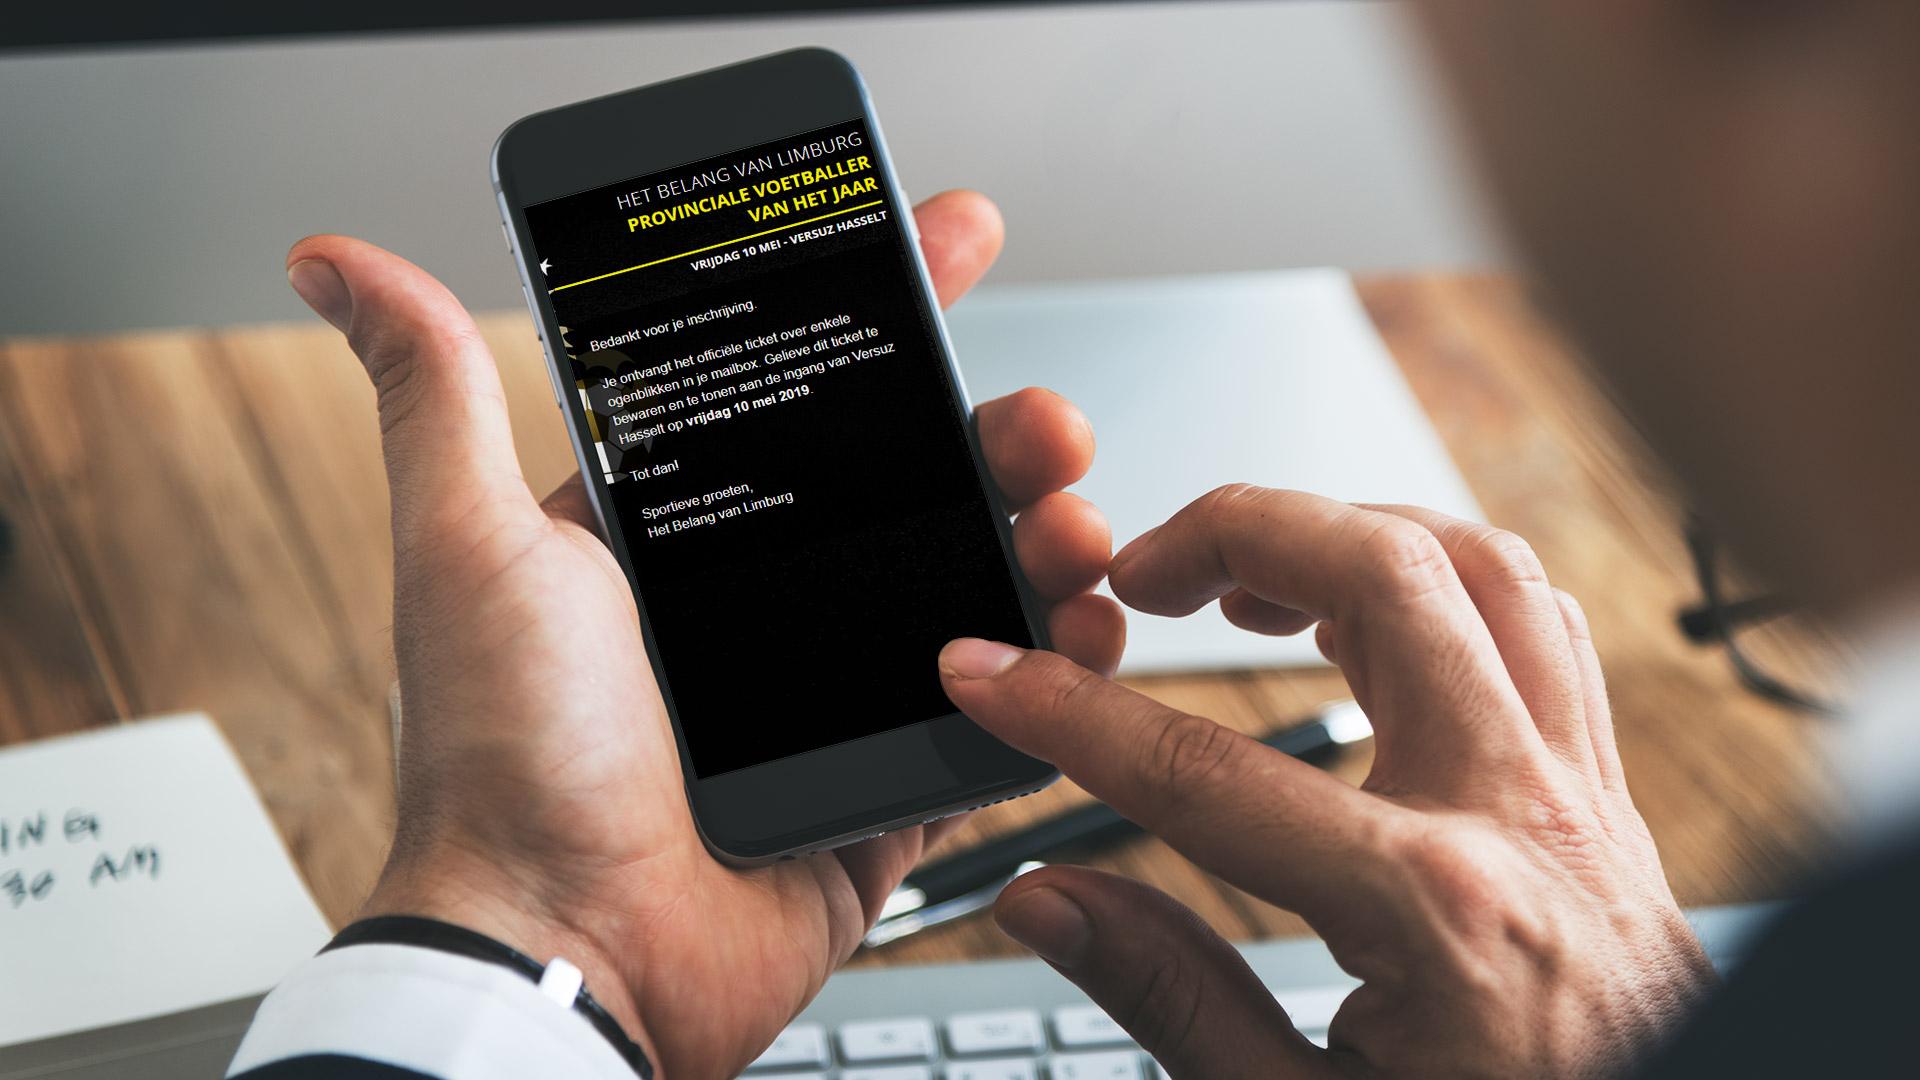 HBvL Digital voucher validation use case image